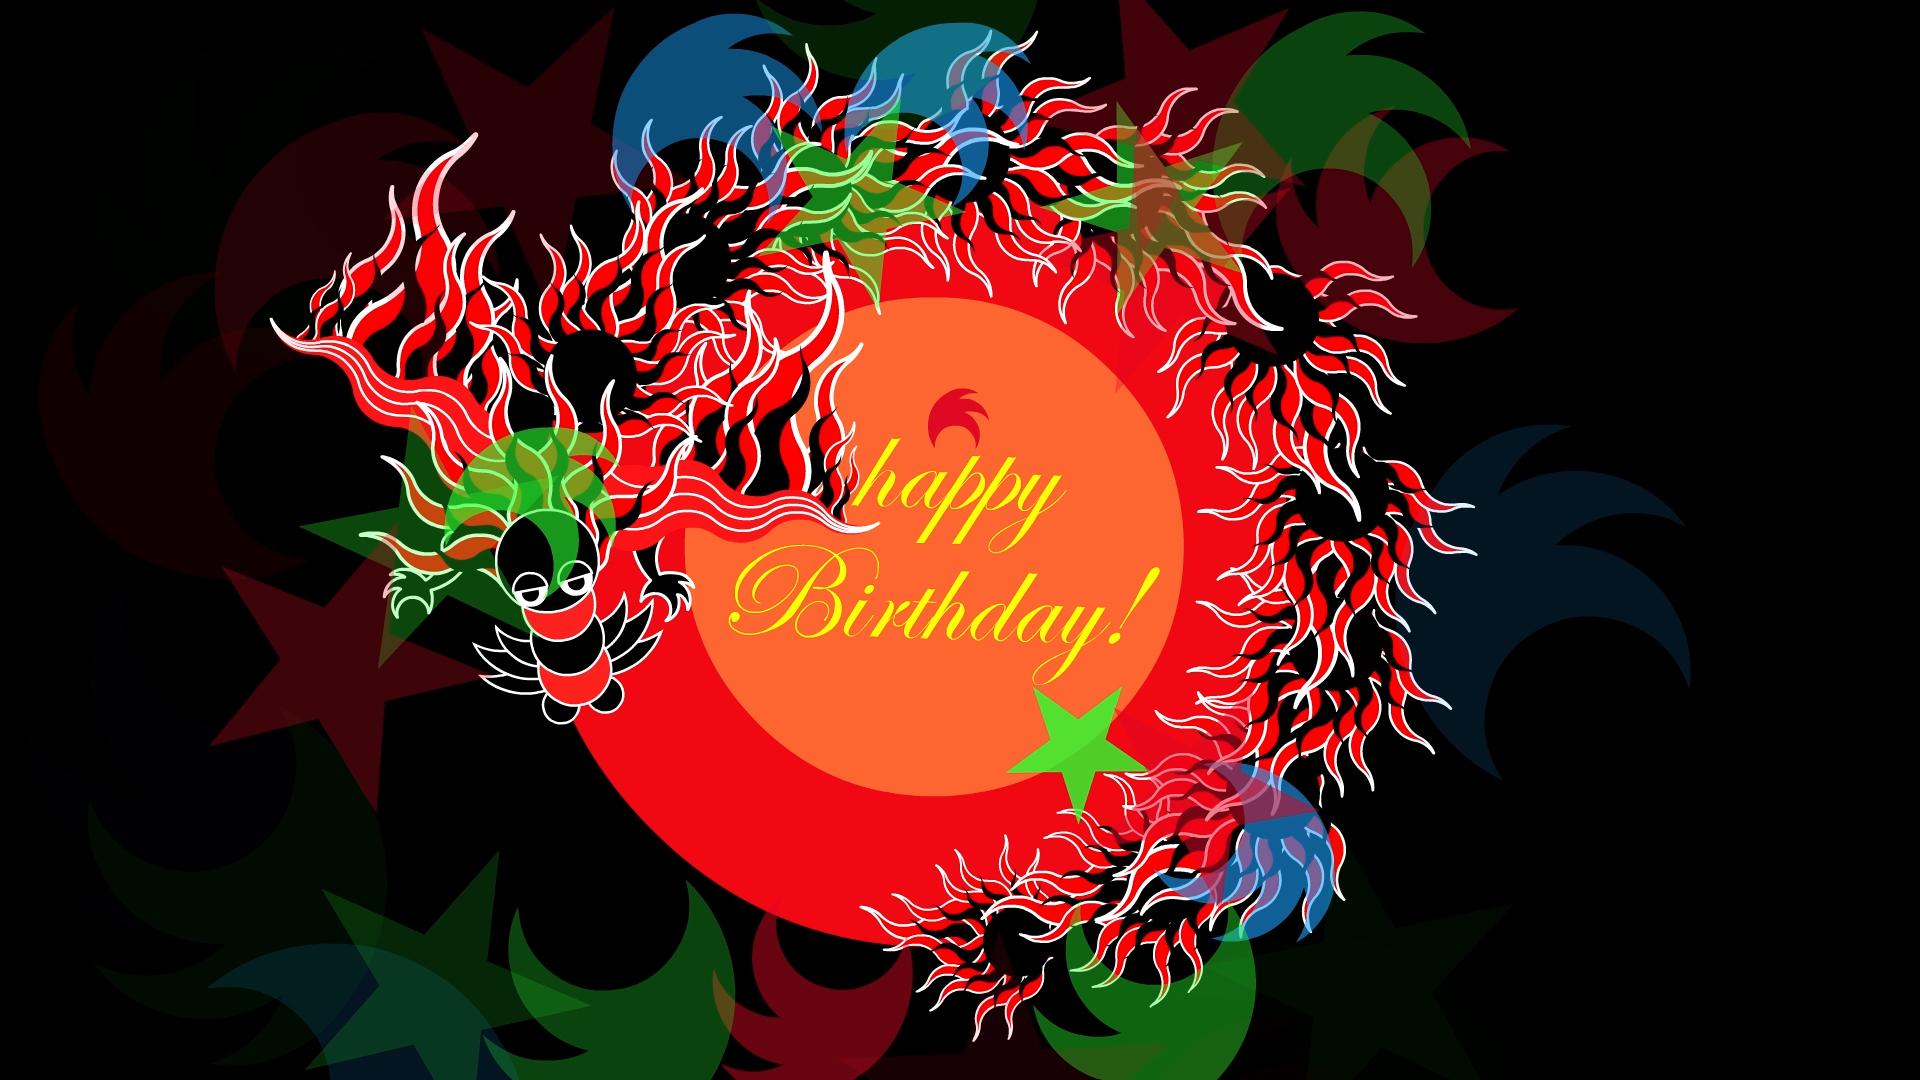 2_216_happy-birthday_1920x1080.jpg